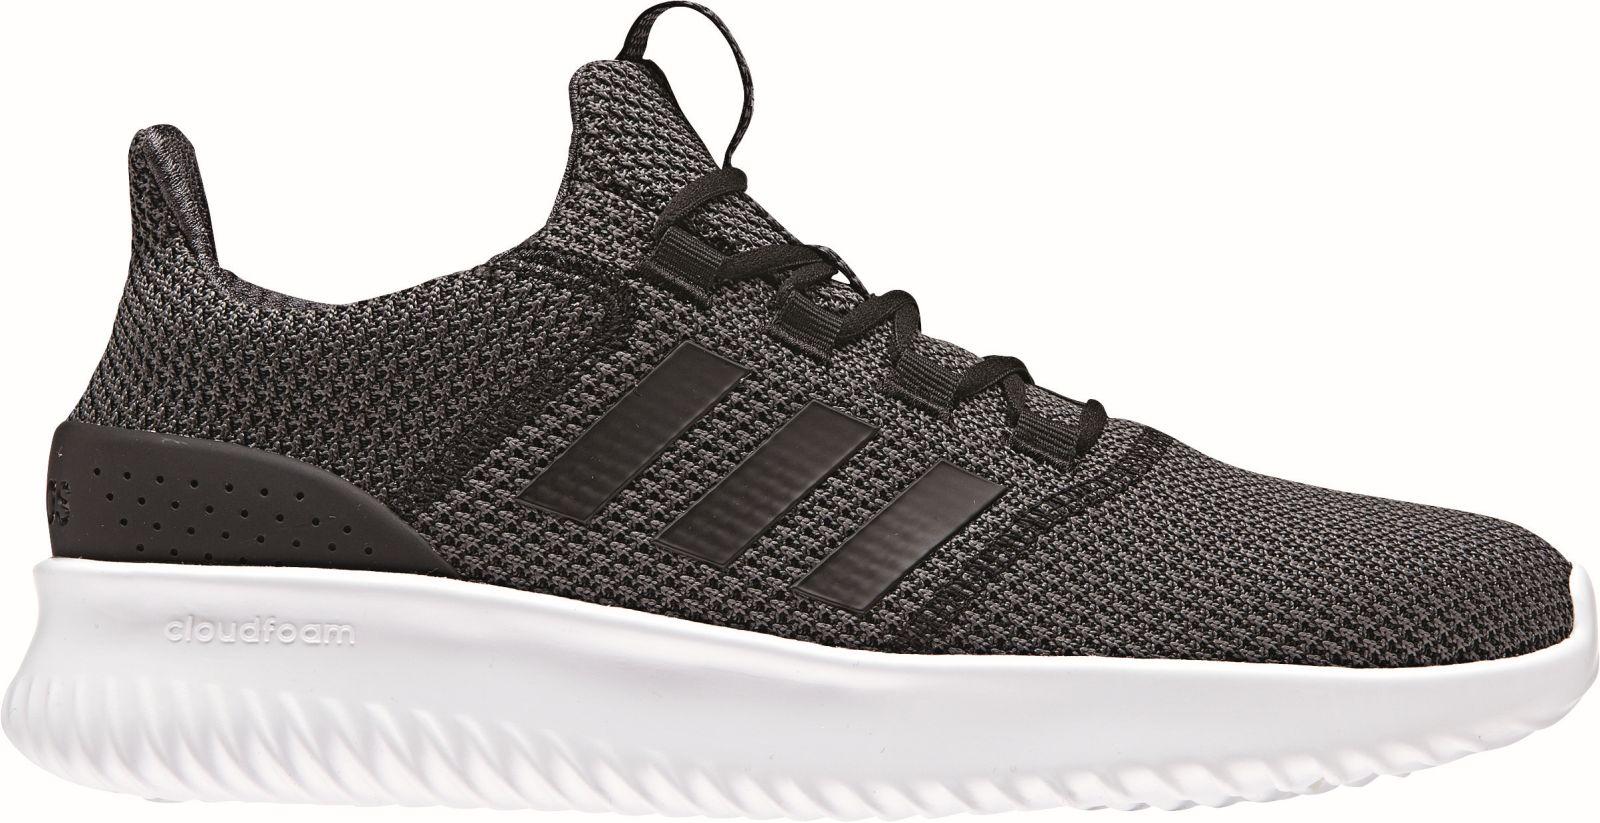 buy popular 3e6fd 46c49 sneaker di adidas uomo Freizeitschuh Cloudfoam ultimate core bianco nero